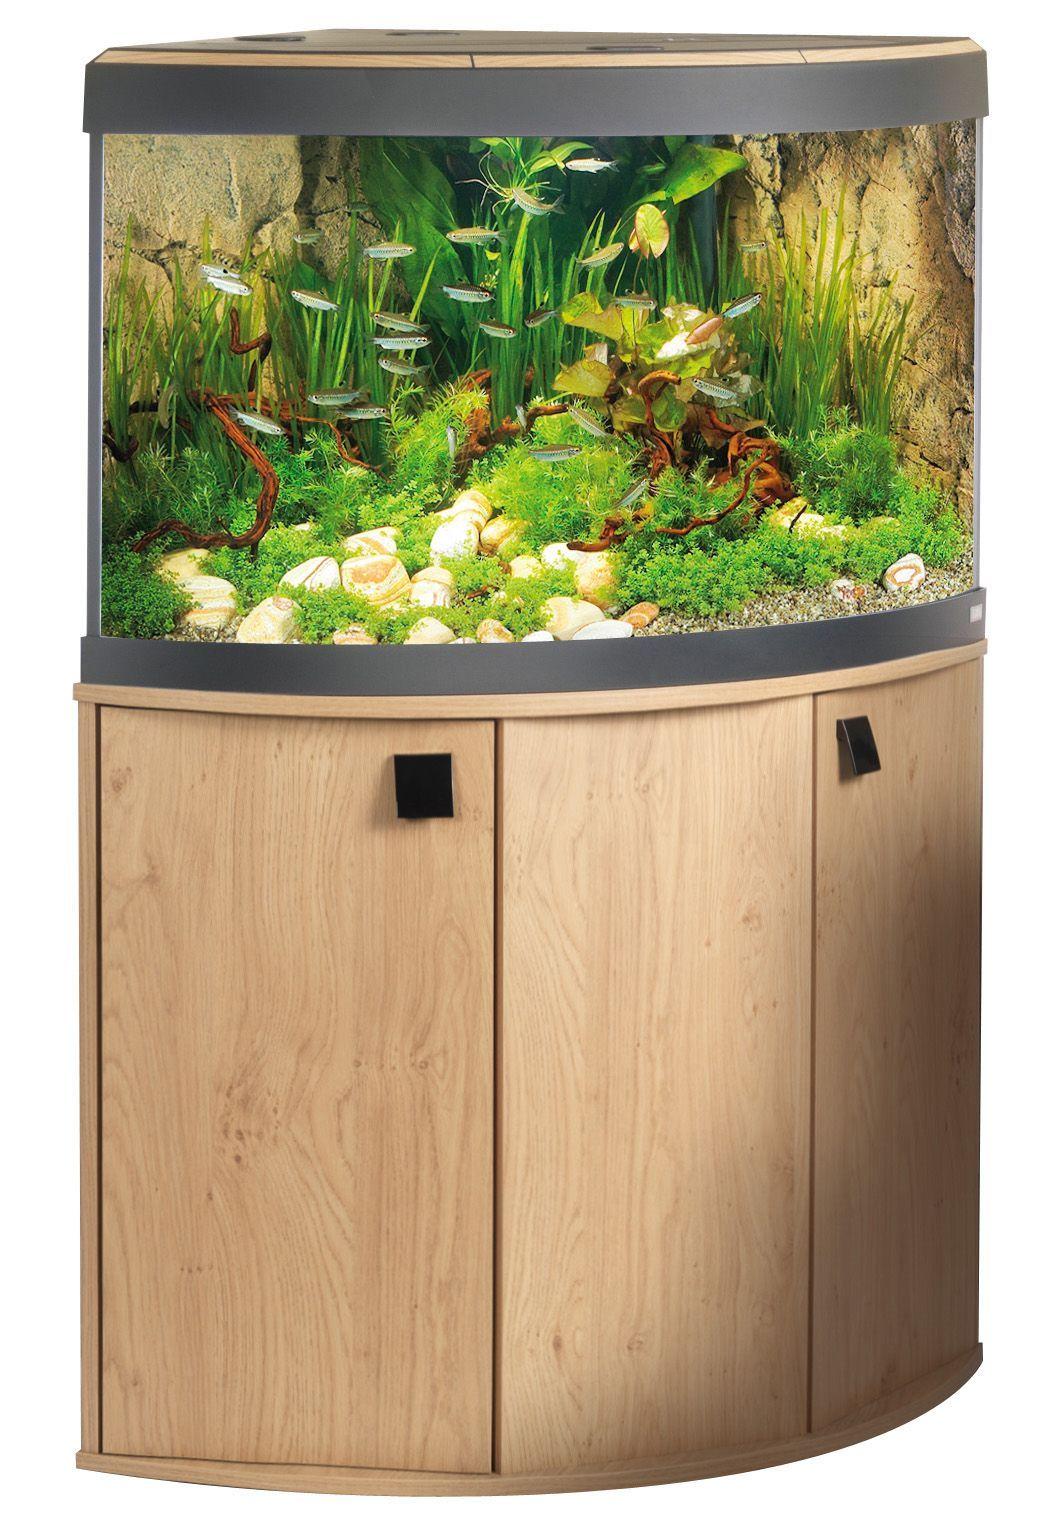 520l cabinet aquarium fish tank tropical - Fluval Vicenza Venezia Fish Tank Cabinet Aquarium Natural Oak Bow Front Curve